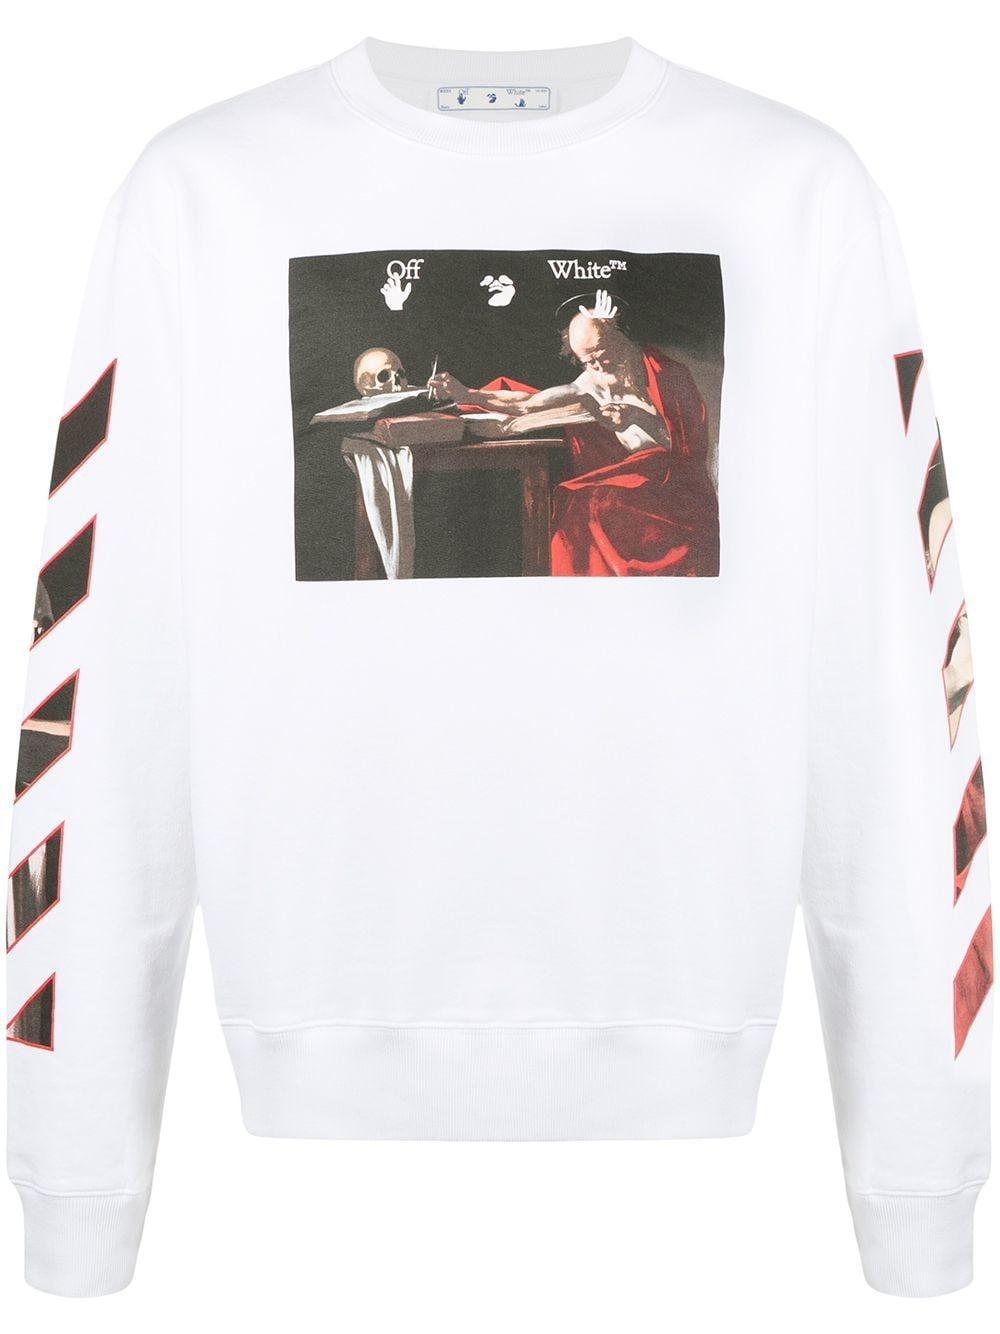 Off-White CARAVAGGIO SLIM CREWNECK WHITE RED - Weiß